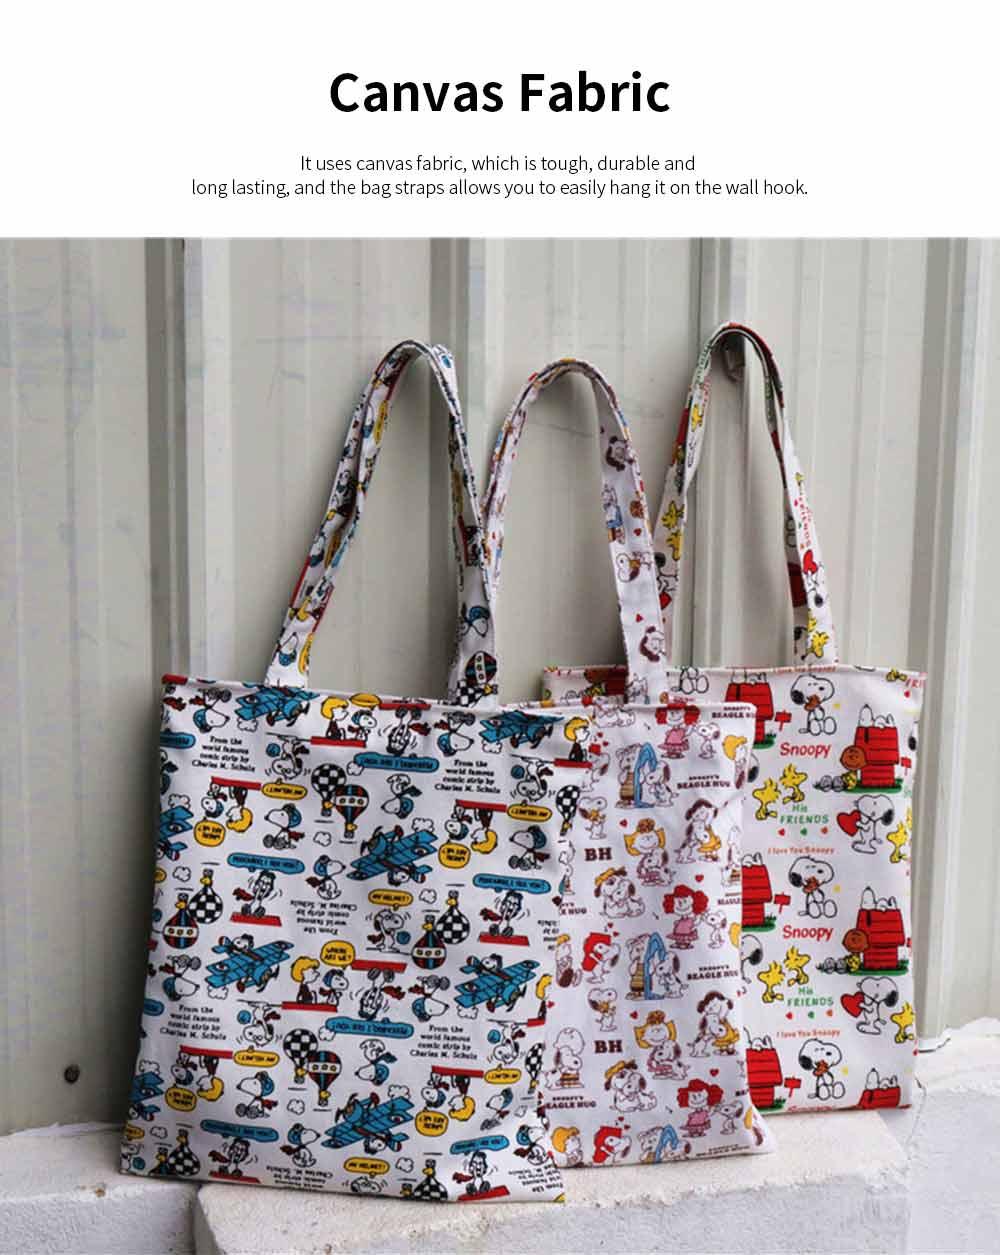 Canvas Cartoon Hand Bag Shoulder Bag, Environmental Protection Shopping Bag, Single-shoulder Bag with Lovely Cartoon Image 1